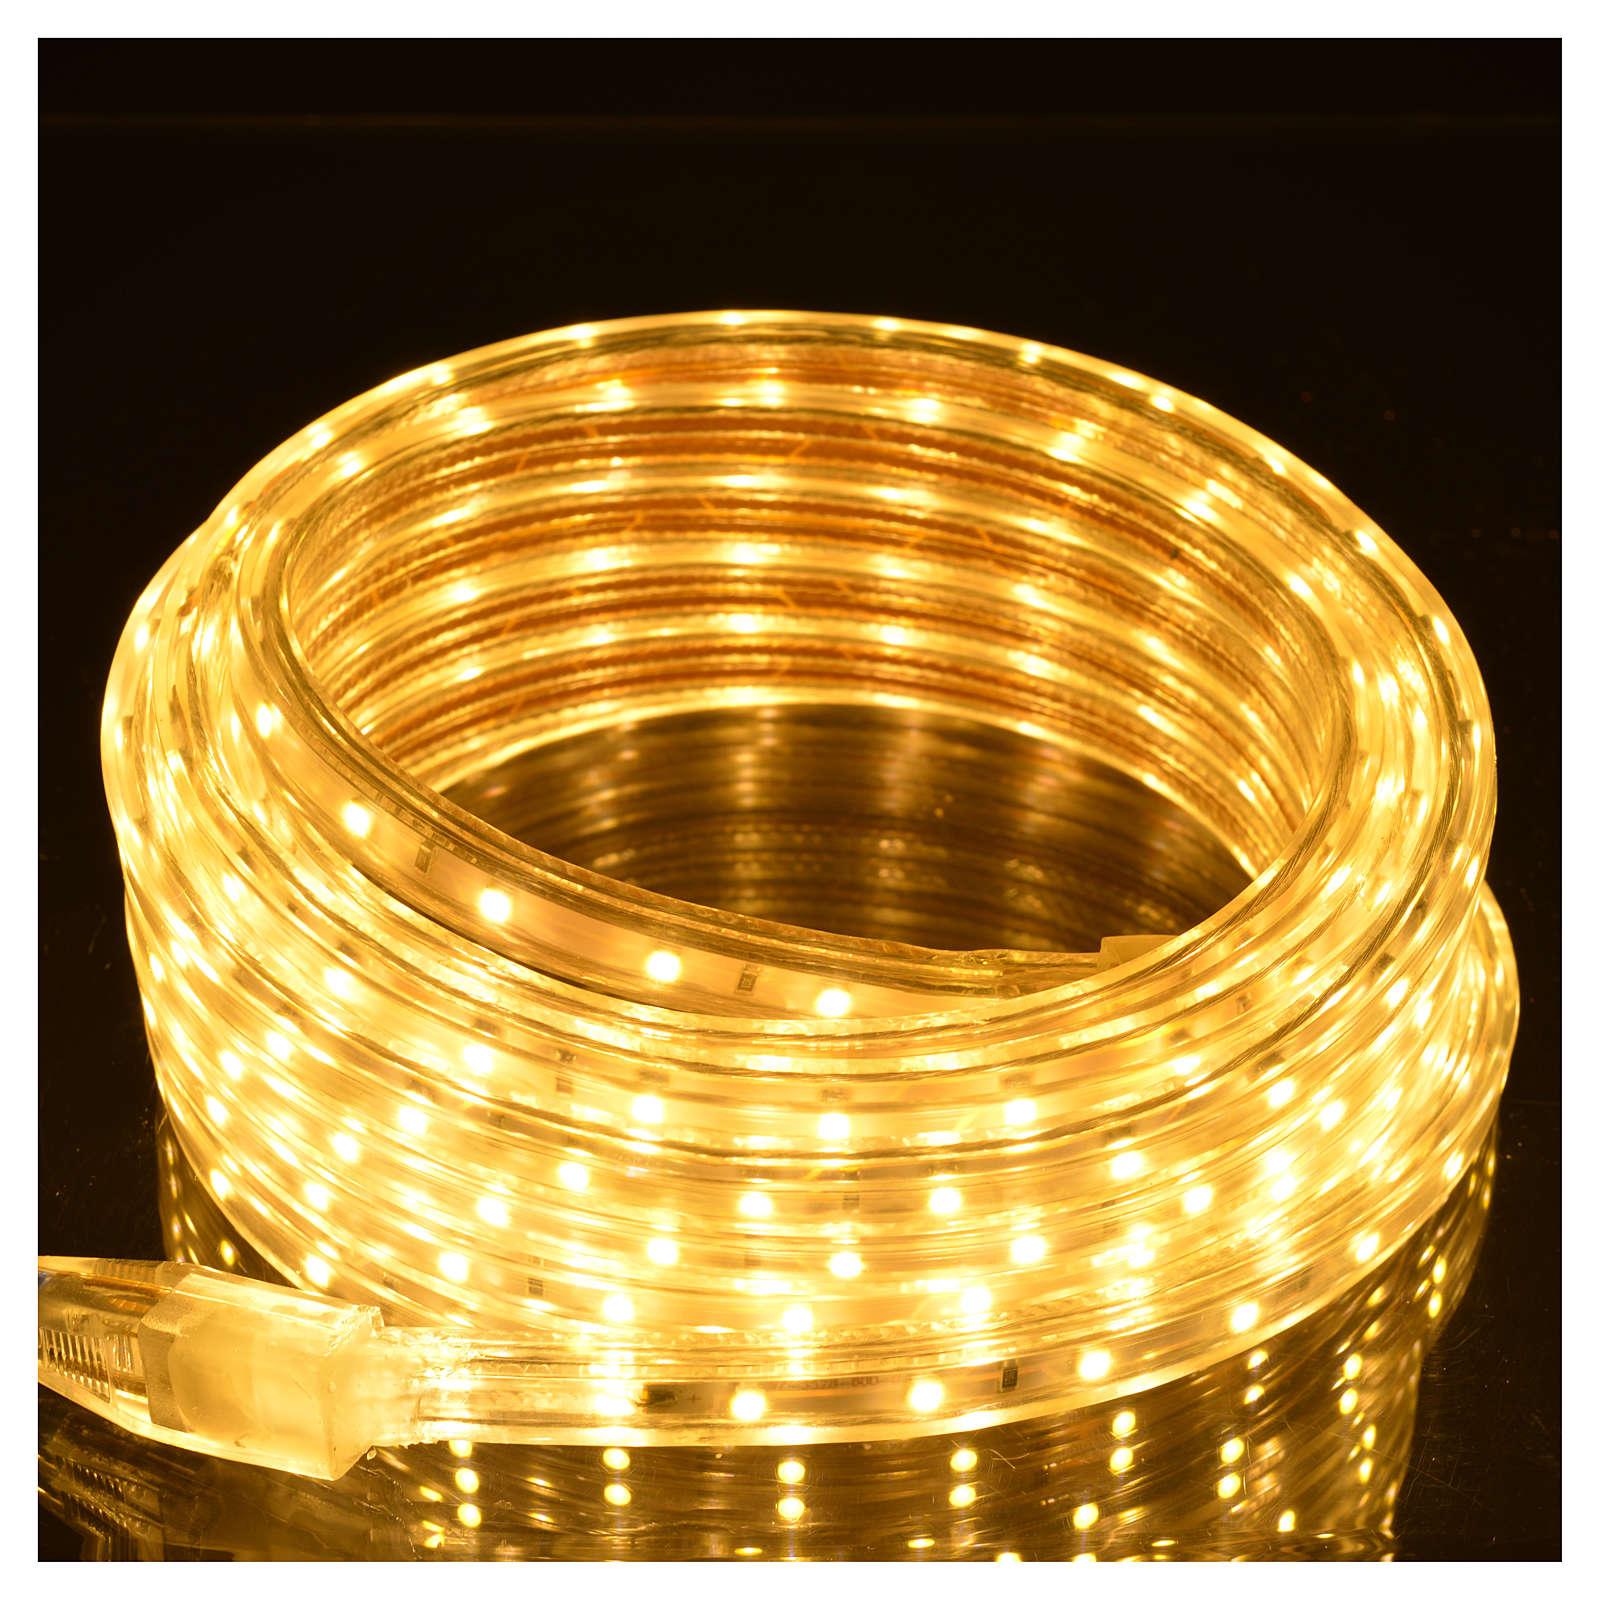 Lampki choinkowe tubo 300 led kolor biały ciepły 3